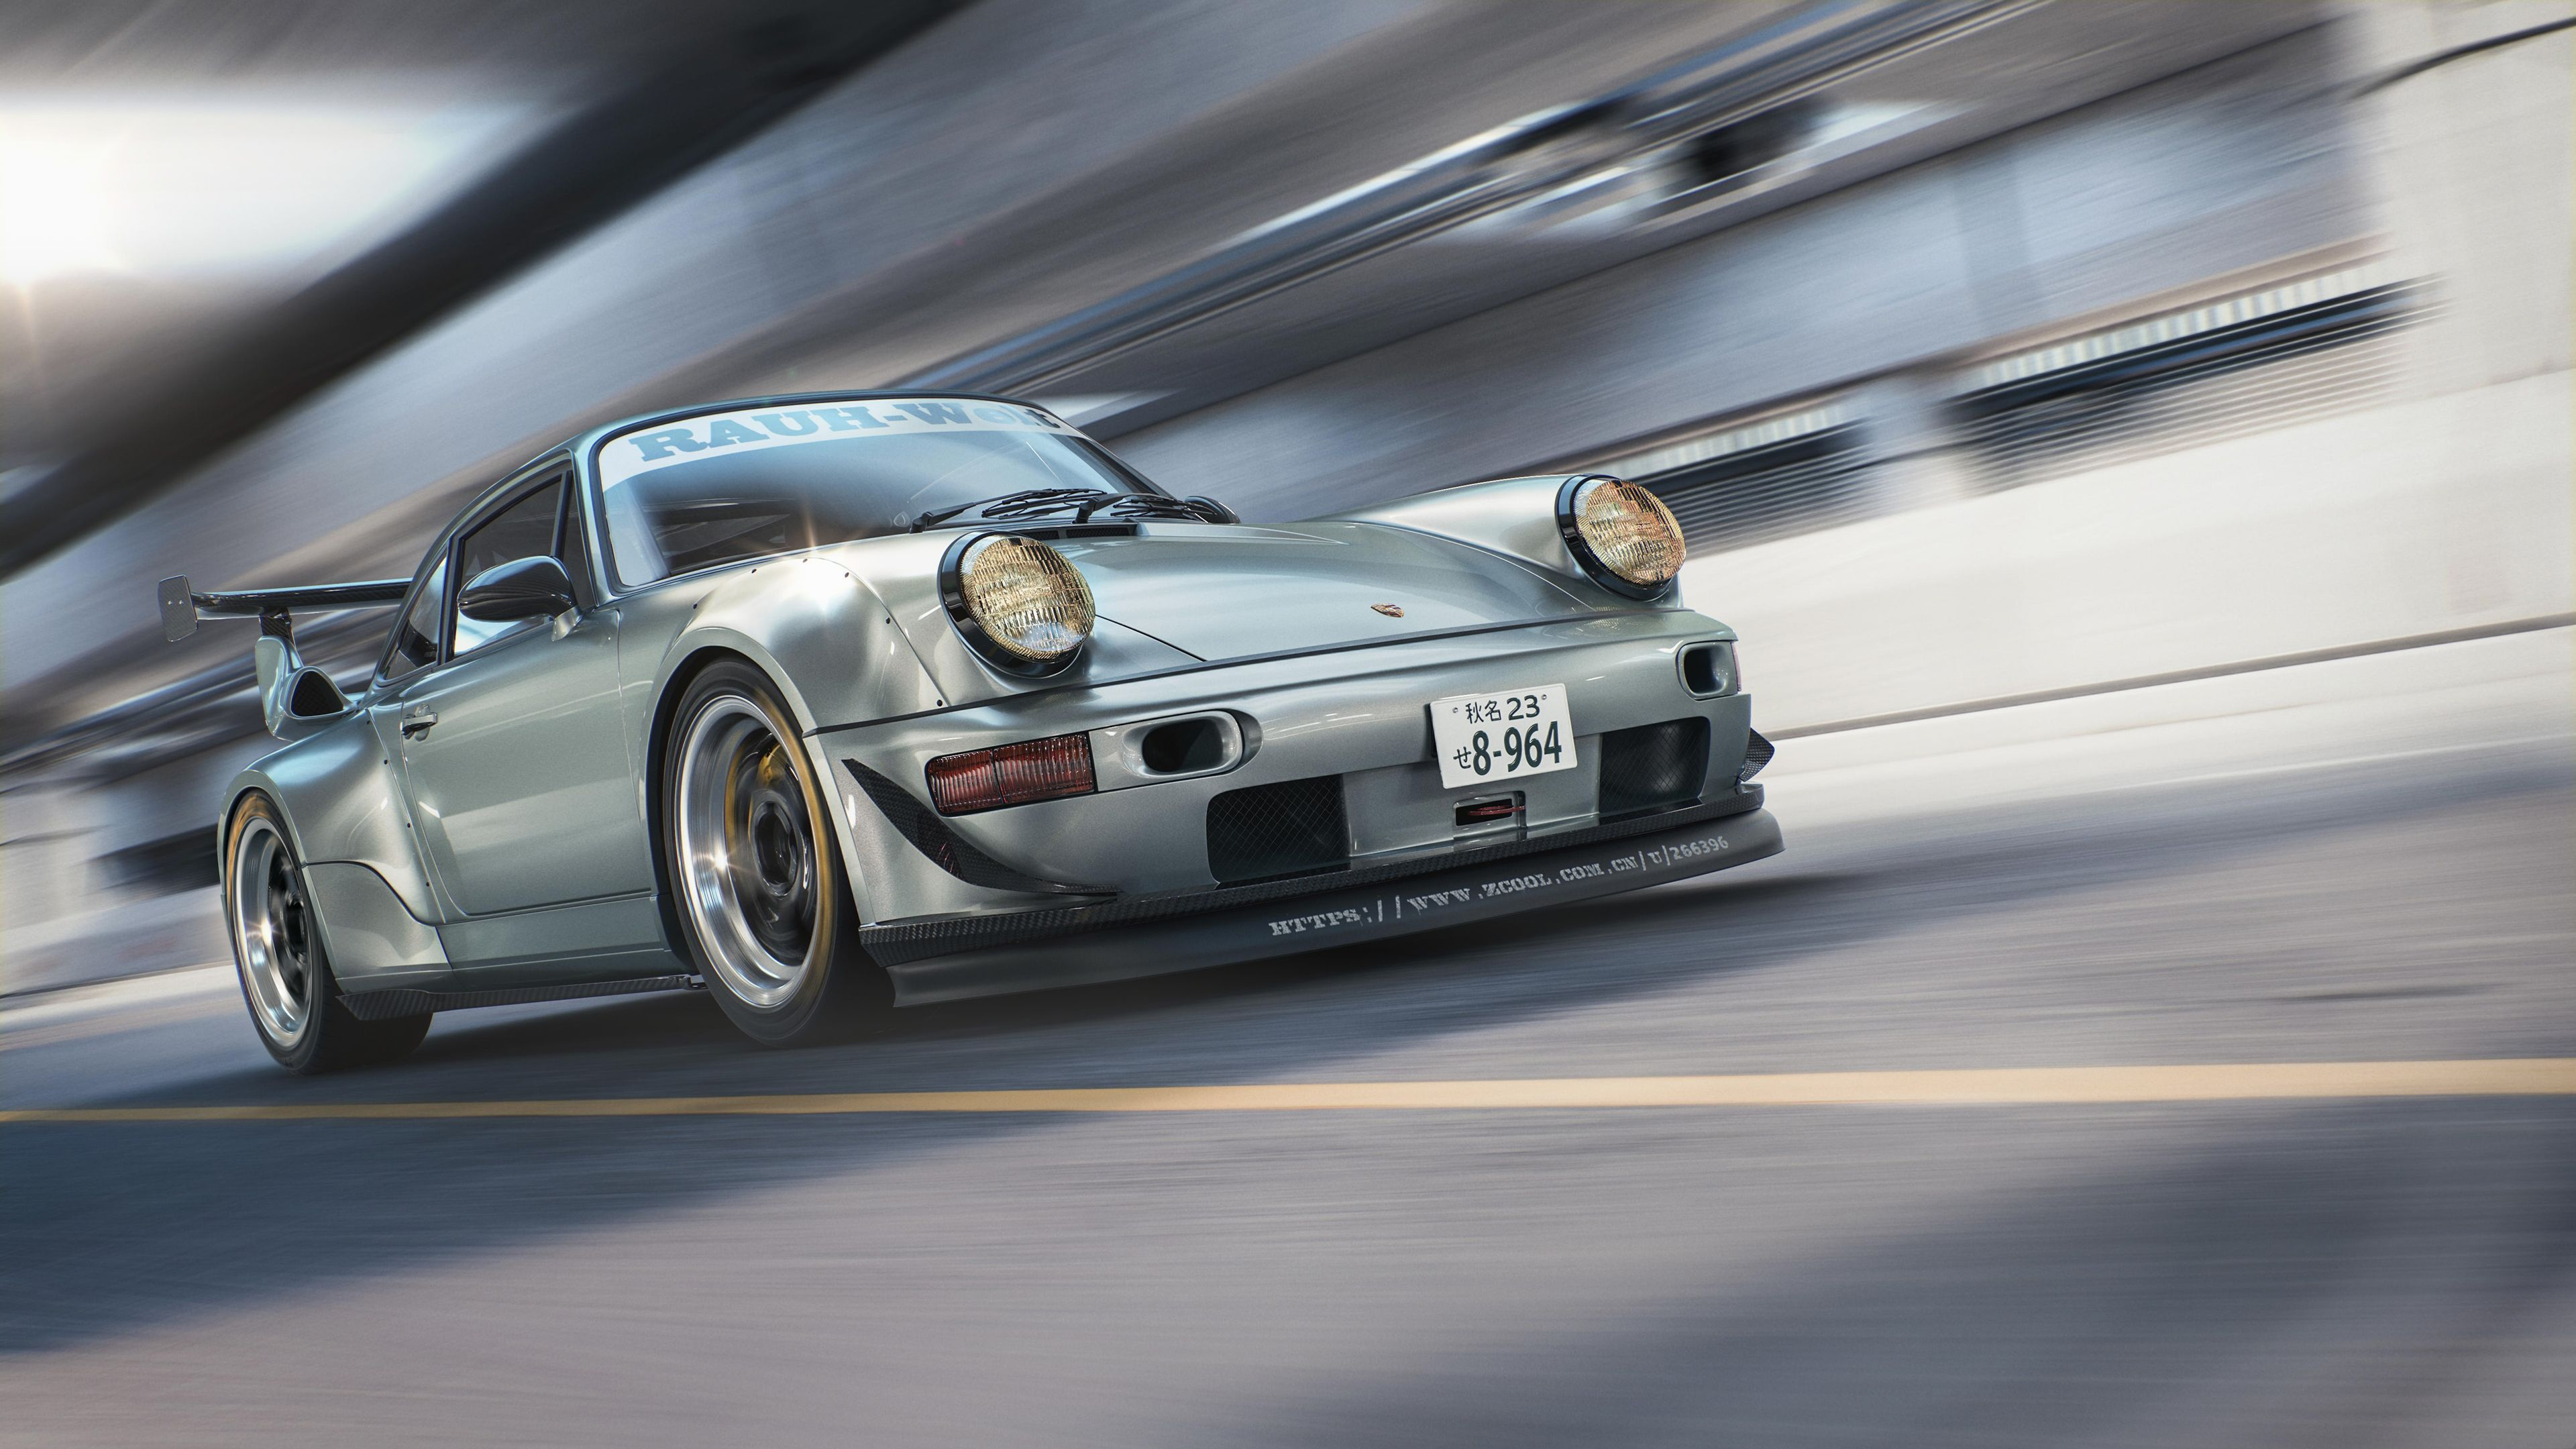 Porsche 964 Wallpapers Top Free Porsche 964 Backgrounds